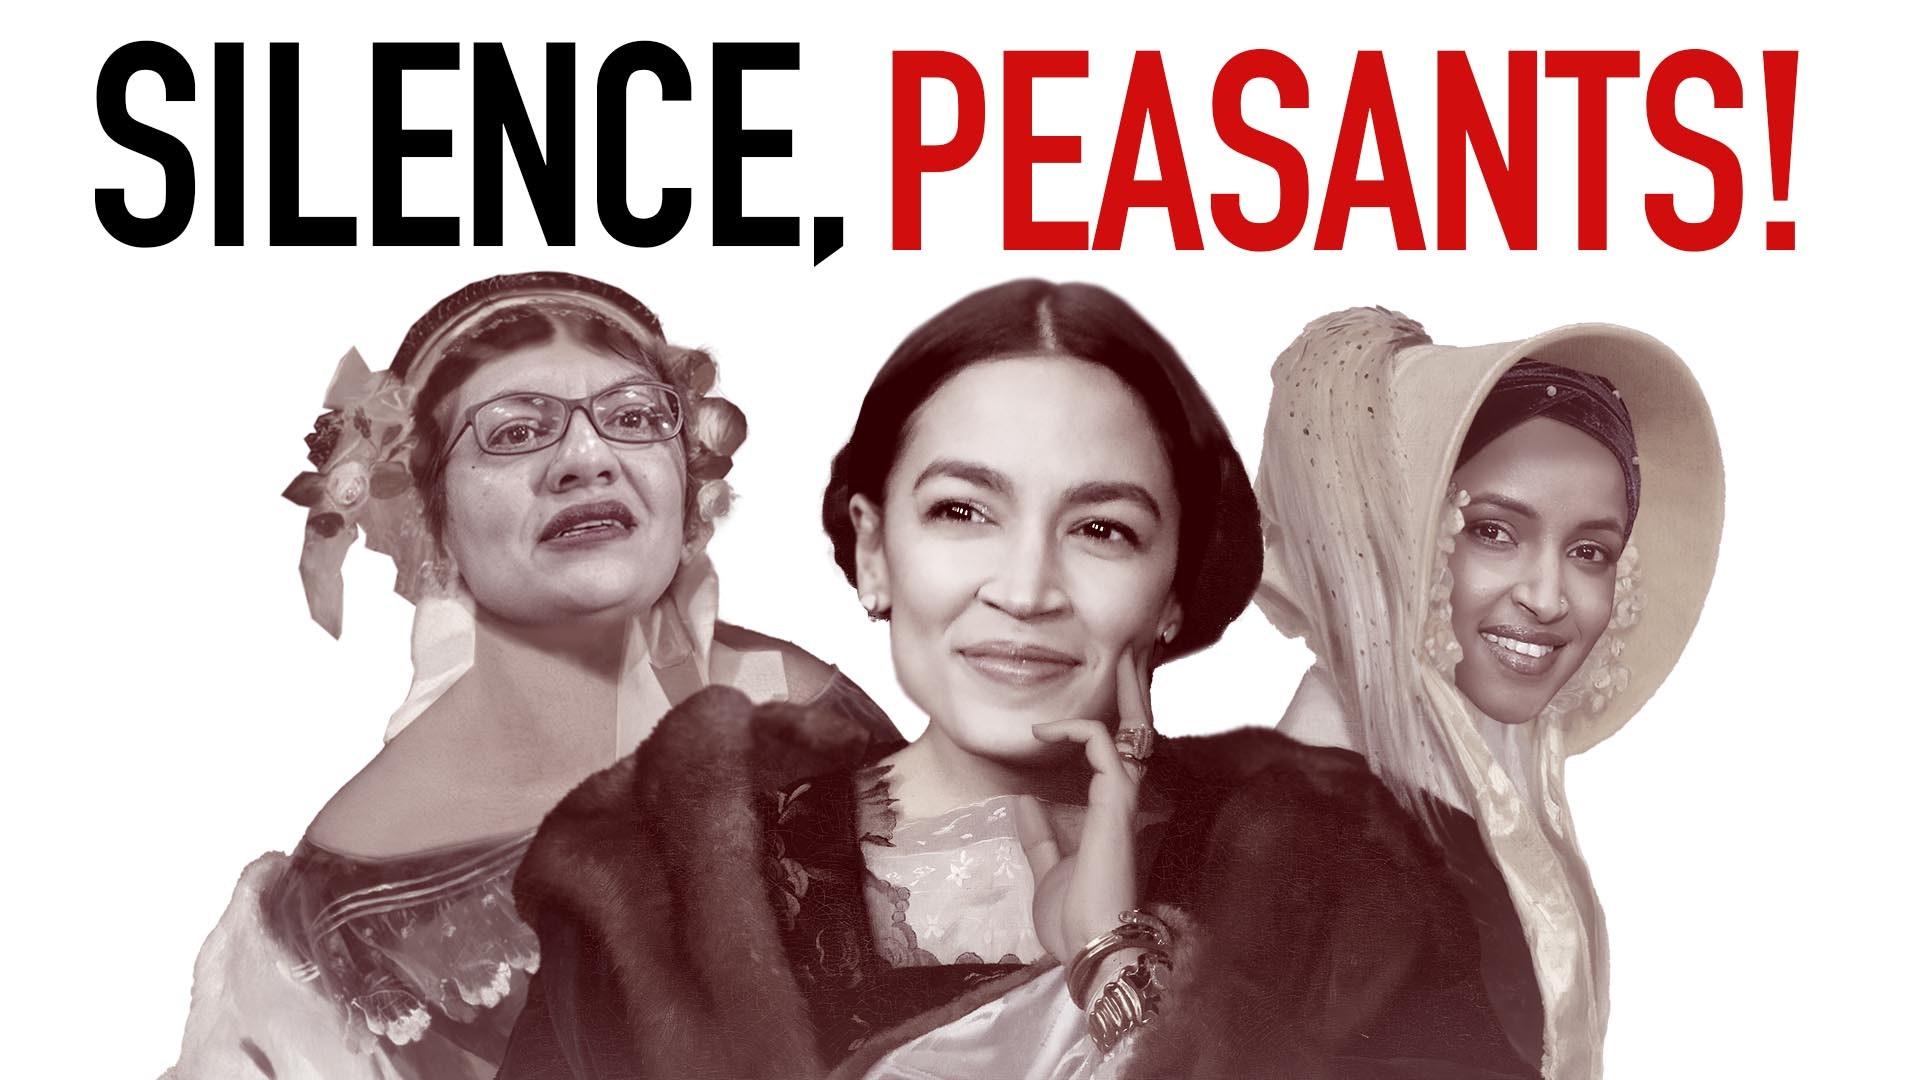 Ep. 1051 -Silence, Peasants!